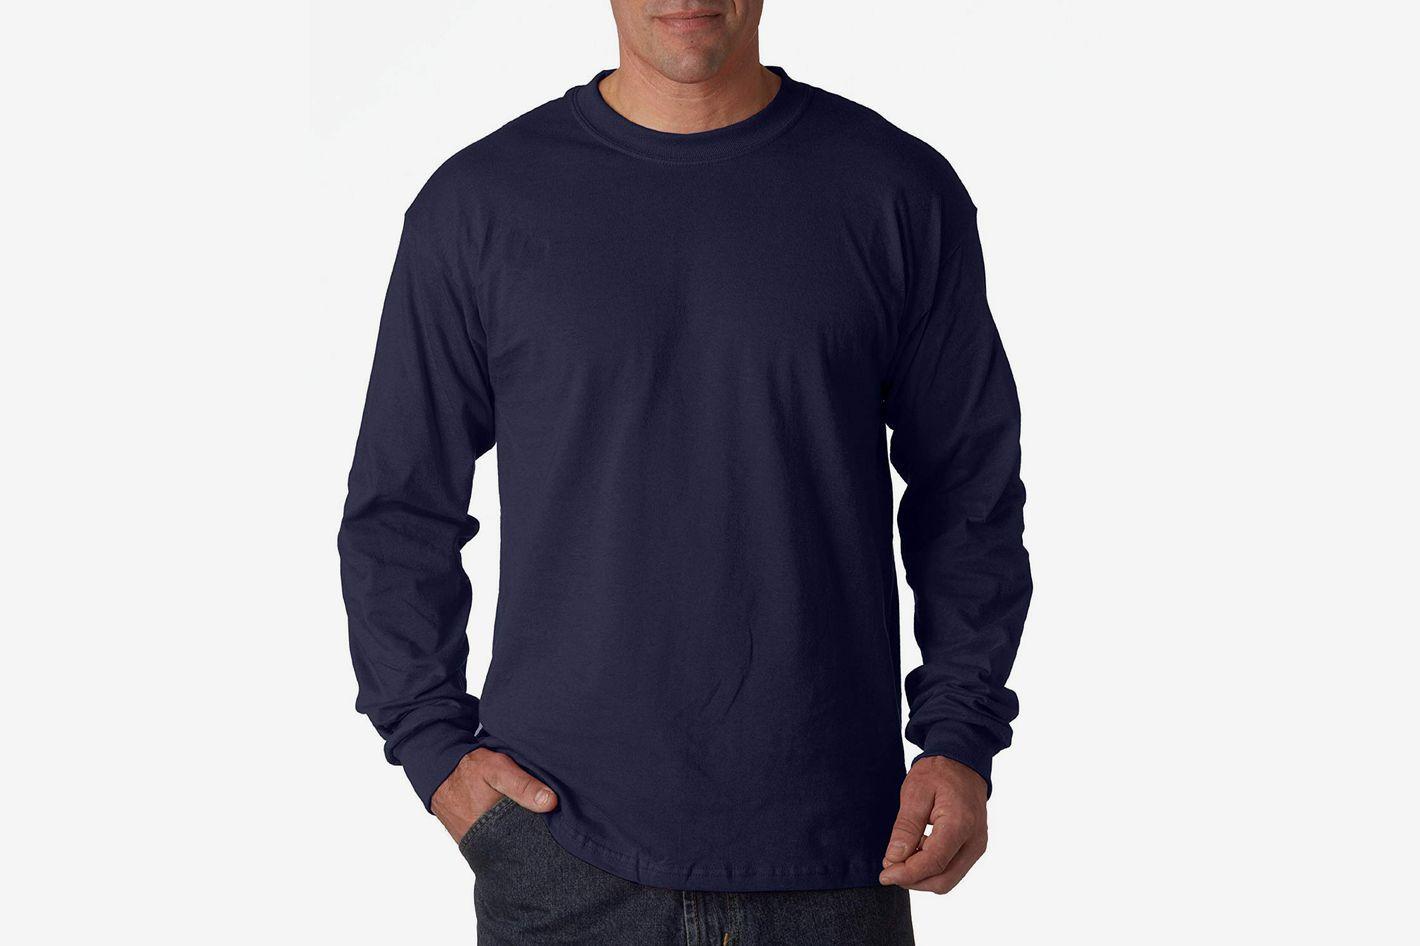 Gildan Heavy Cotton 100% Cotton Long Sleeve T-Shirt